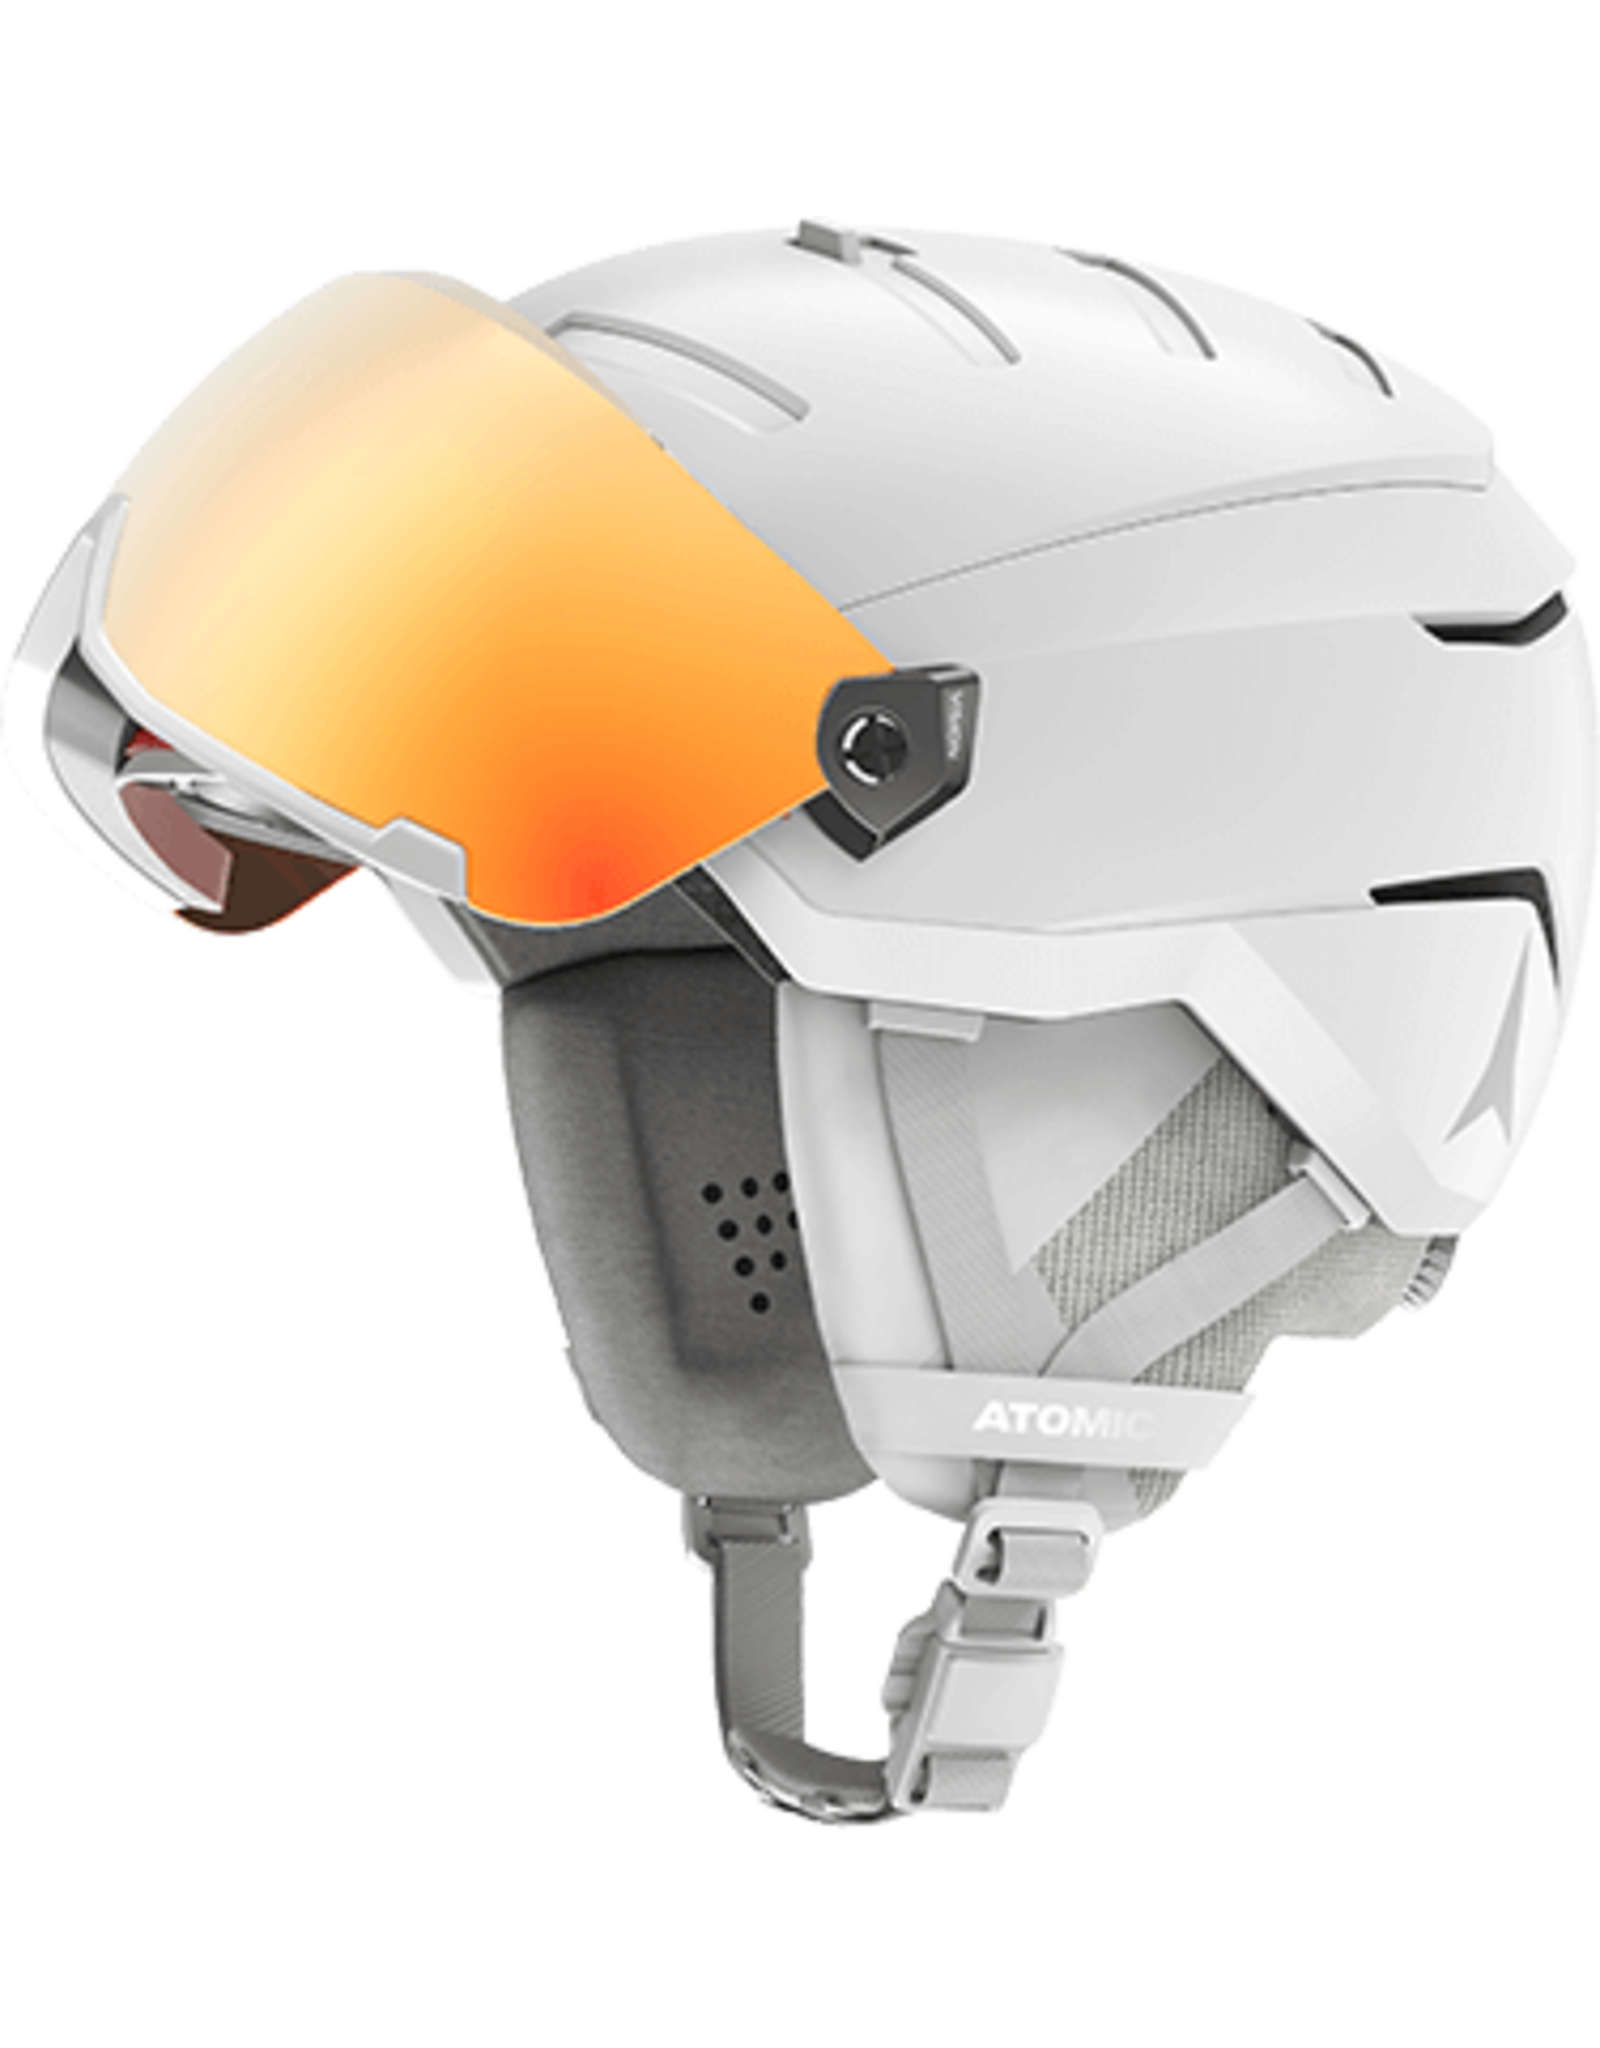 ATOMIC Savor GT AMID Visor HD White